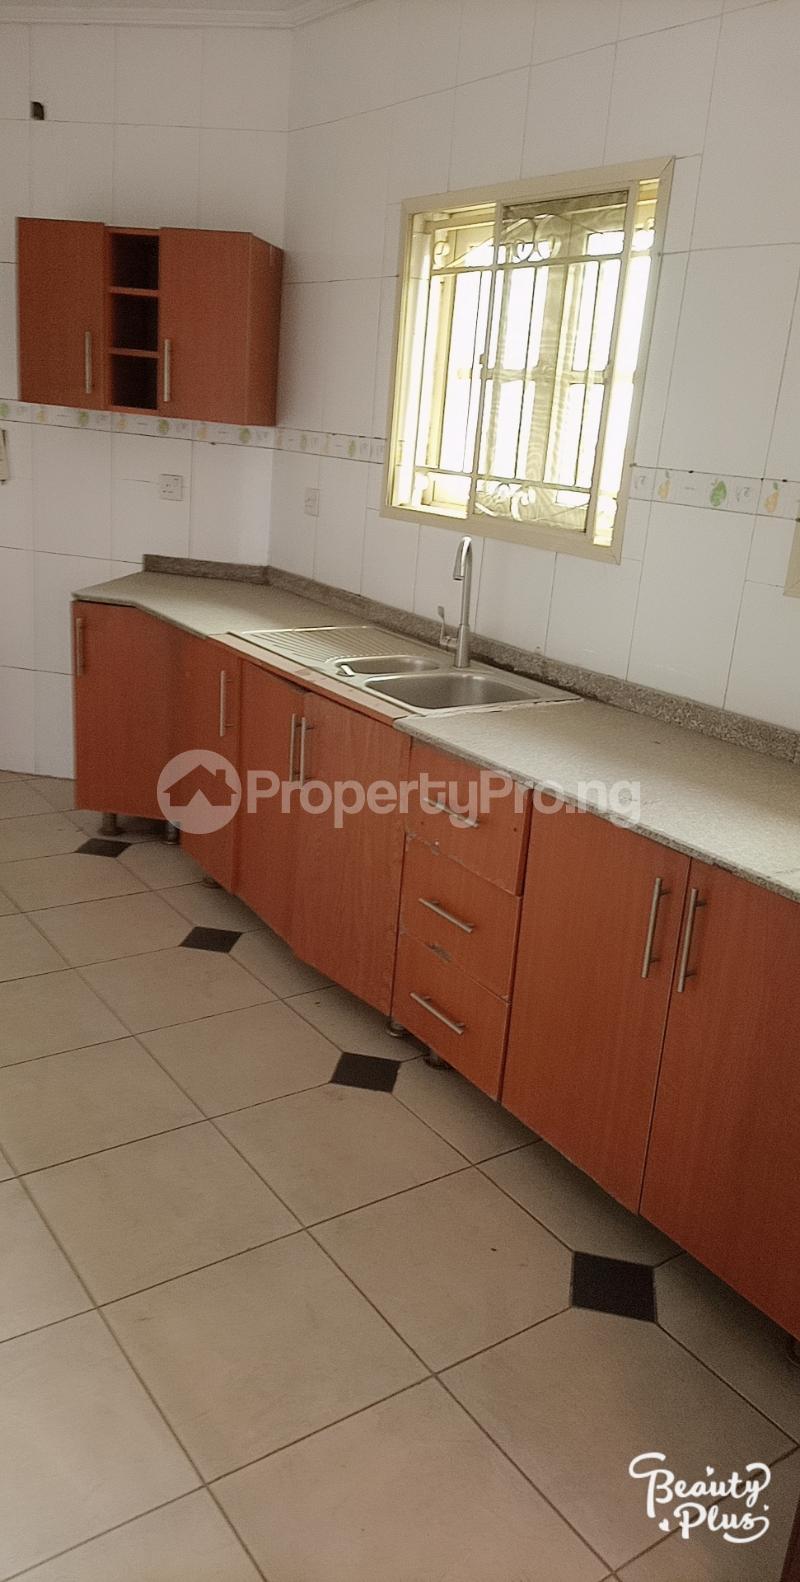 3 bedroom Flat / Apartment for rent Oke Afa isolo. Lagos Mainland Oke-Afa Isolo Lagos - 4